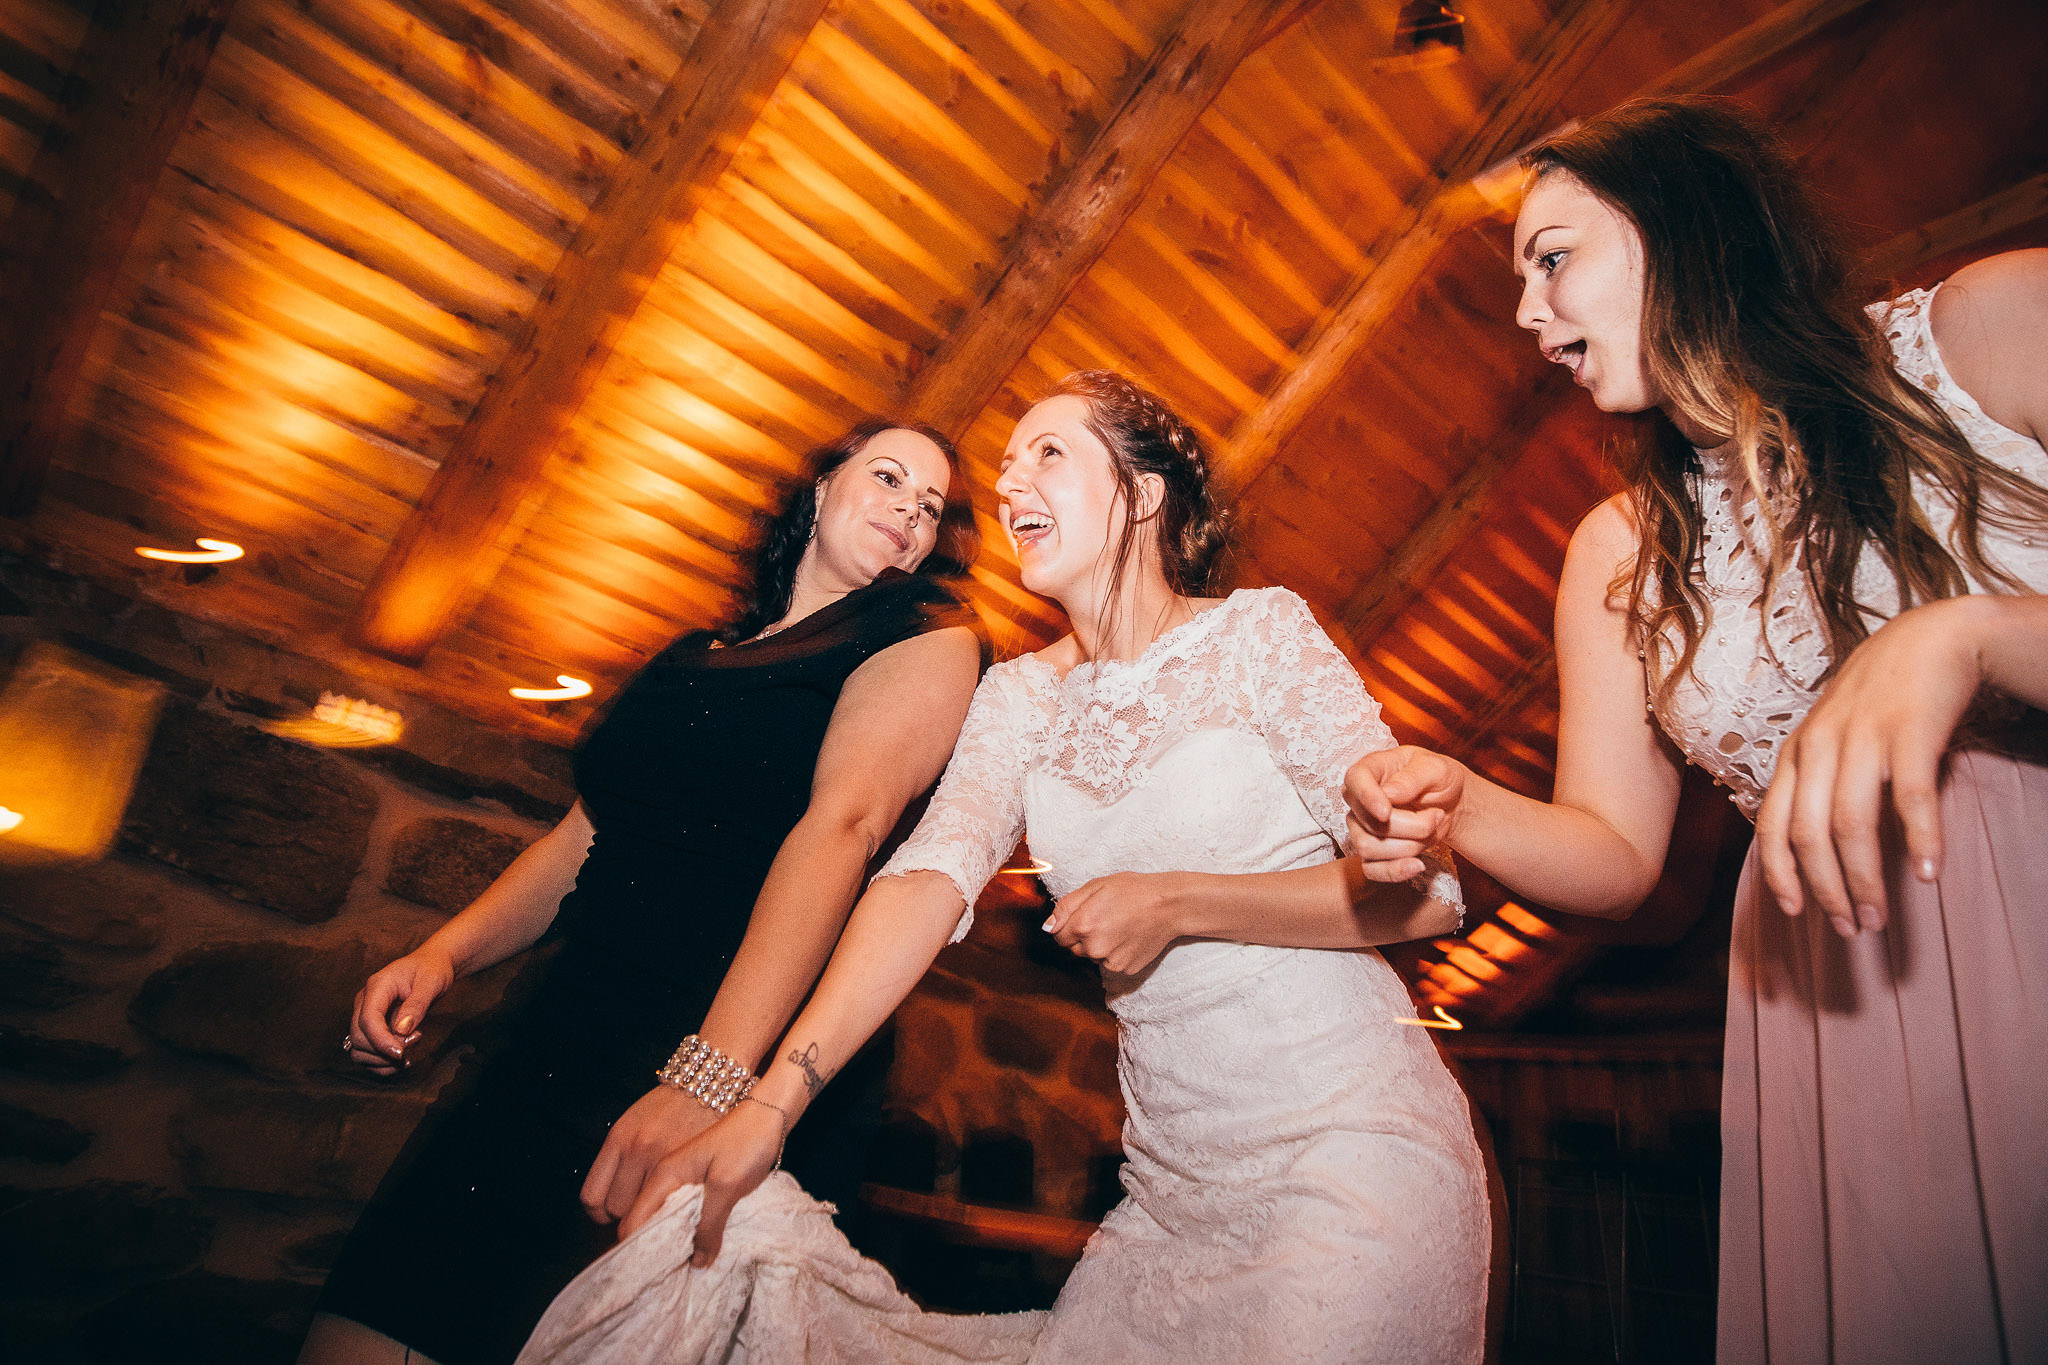 Norway+wedding+photographer+elopement+pre+wedding+Rogaland+bryllupsfotograf+Casey+Arneson-155.jpg